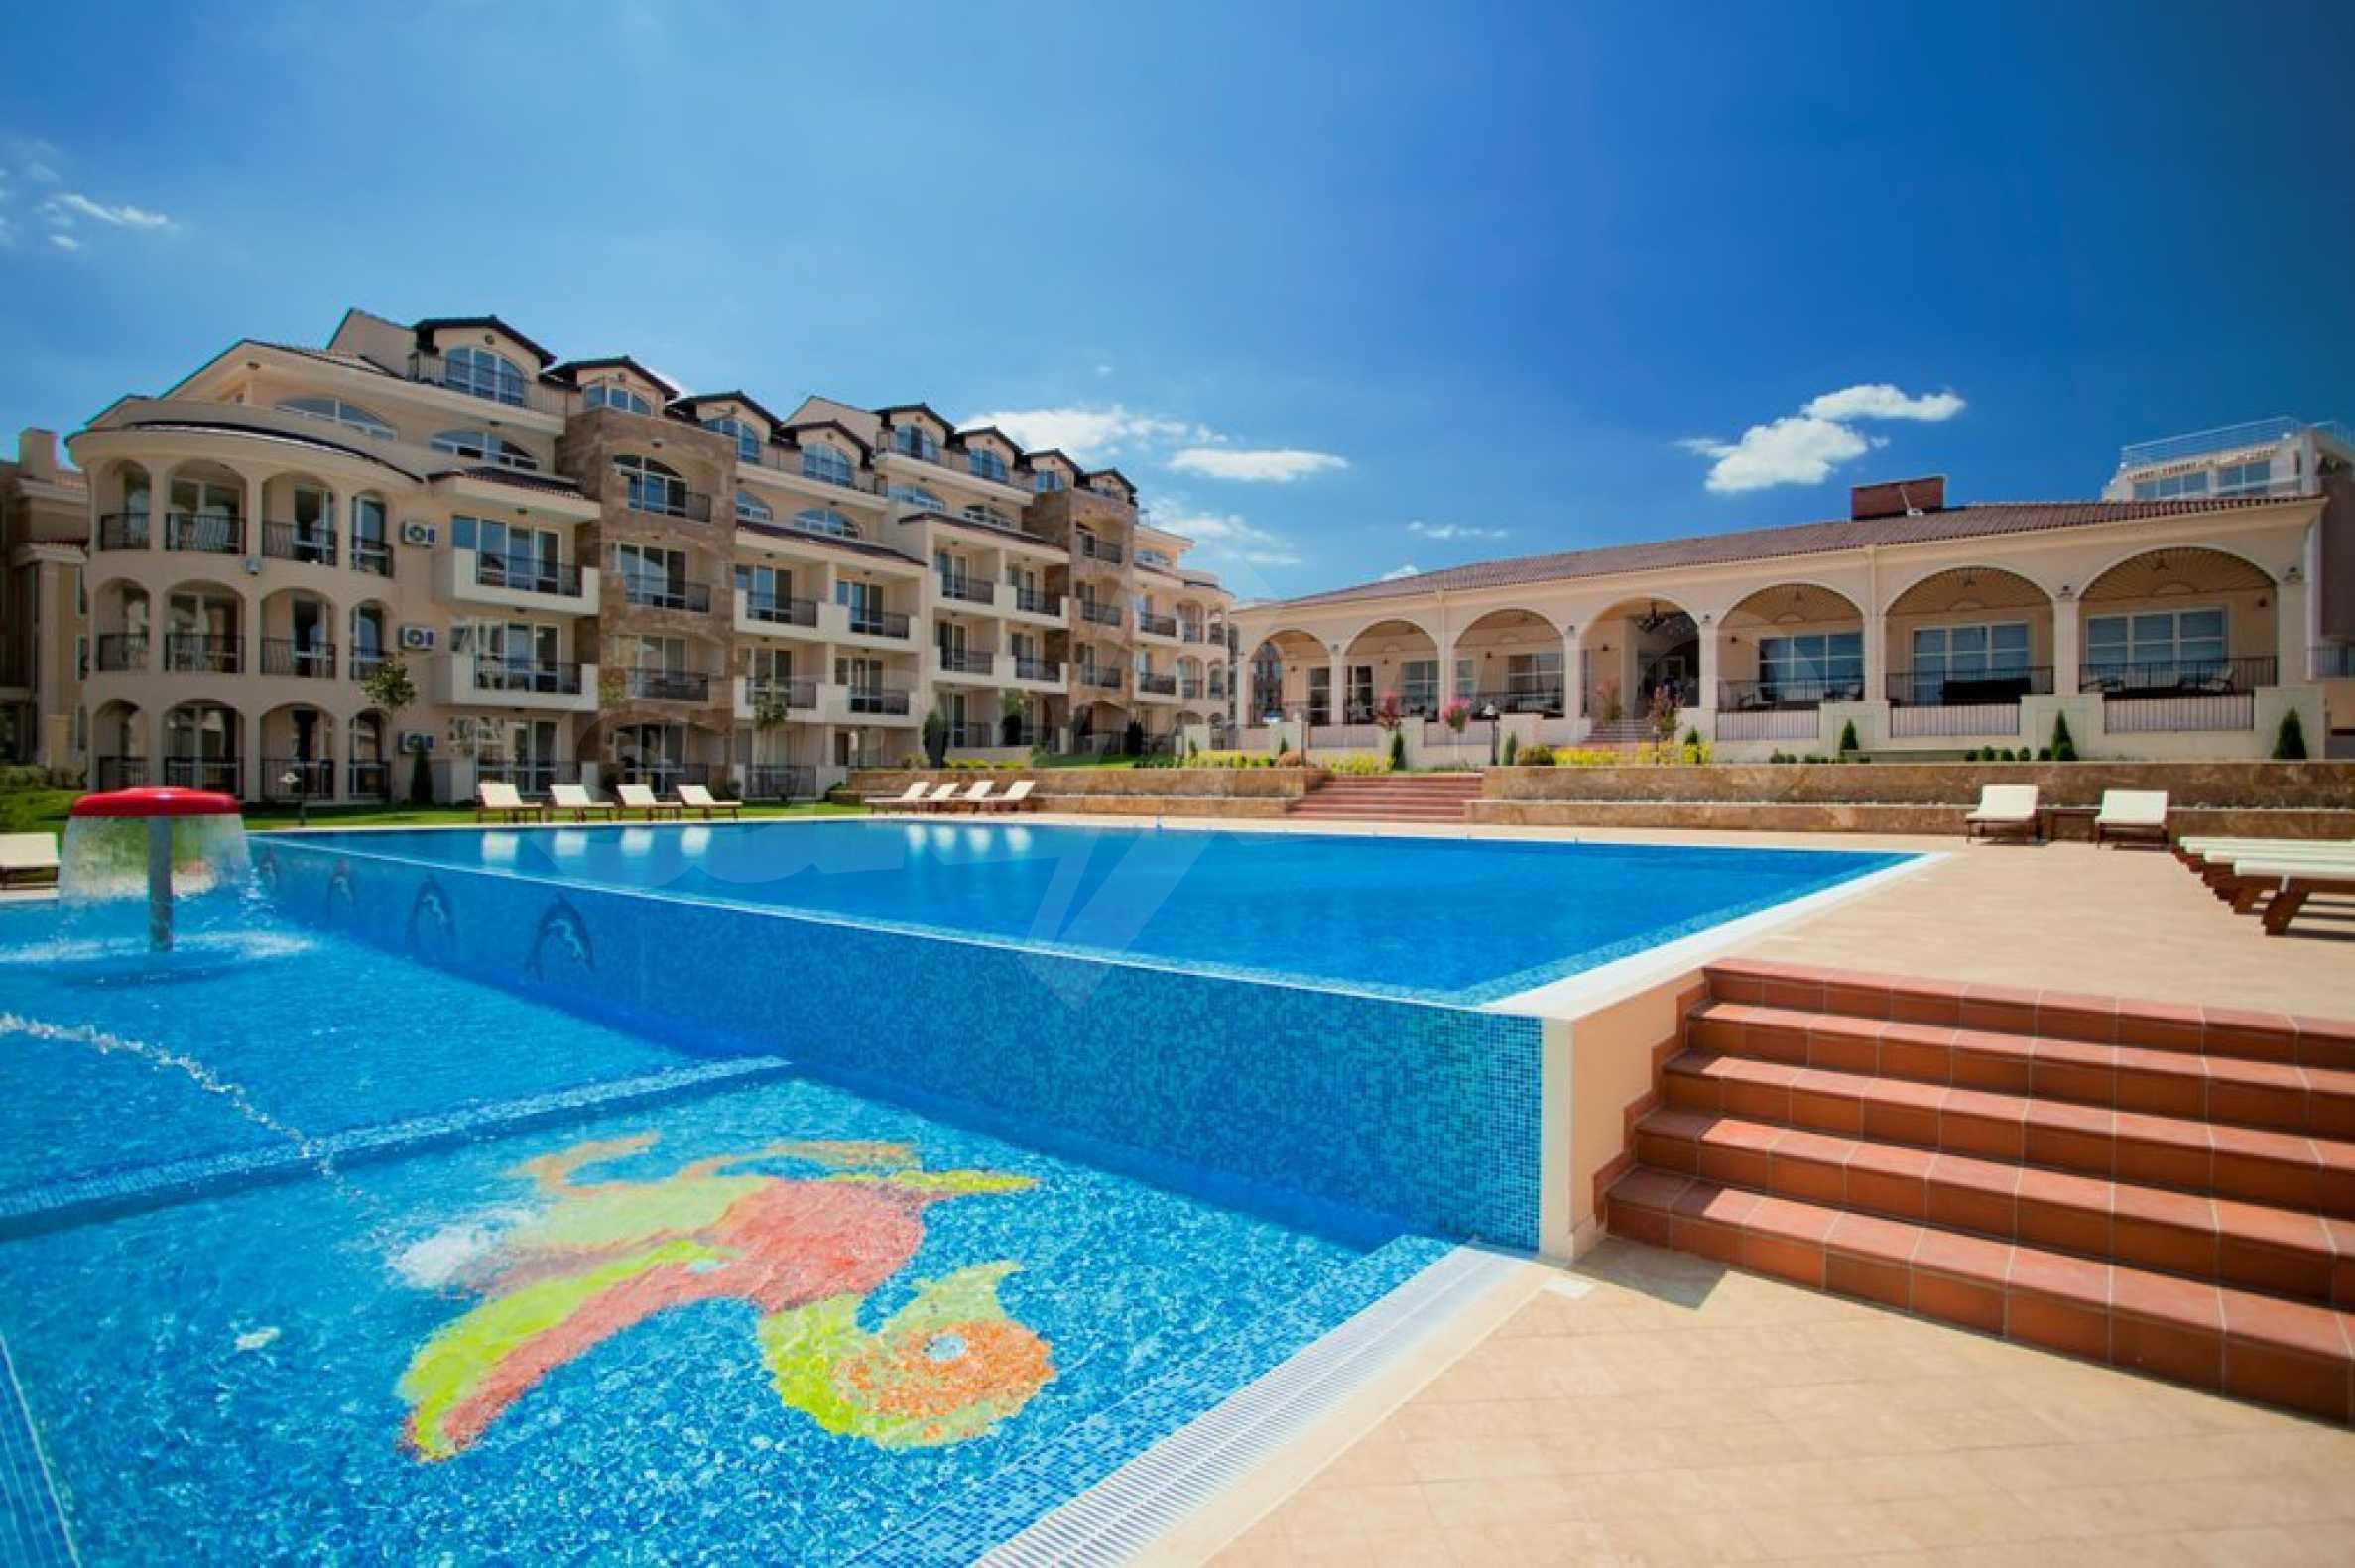 New apartment complex Atia resort in Chernomorets 10